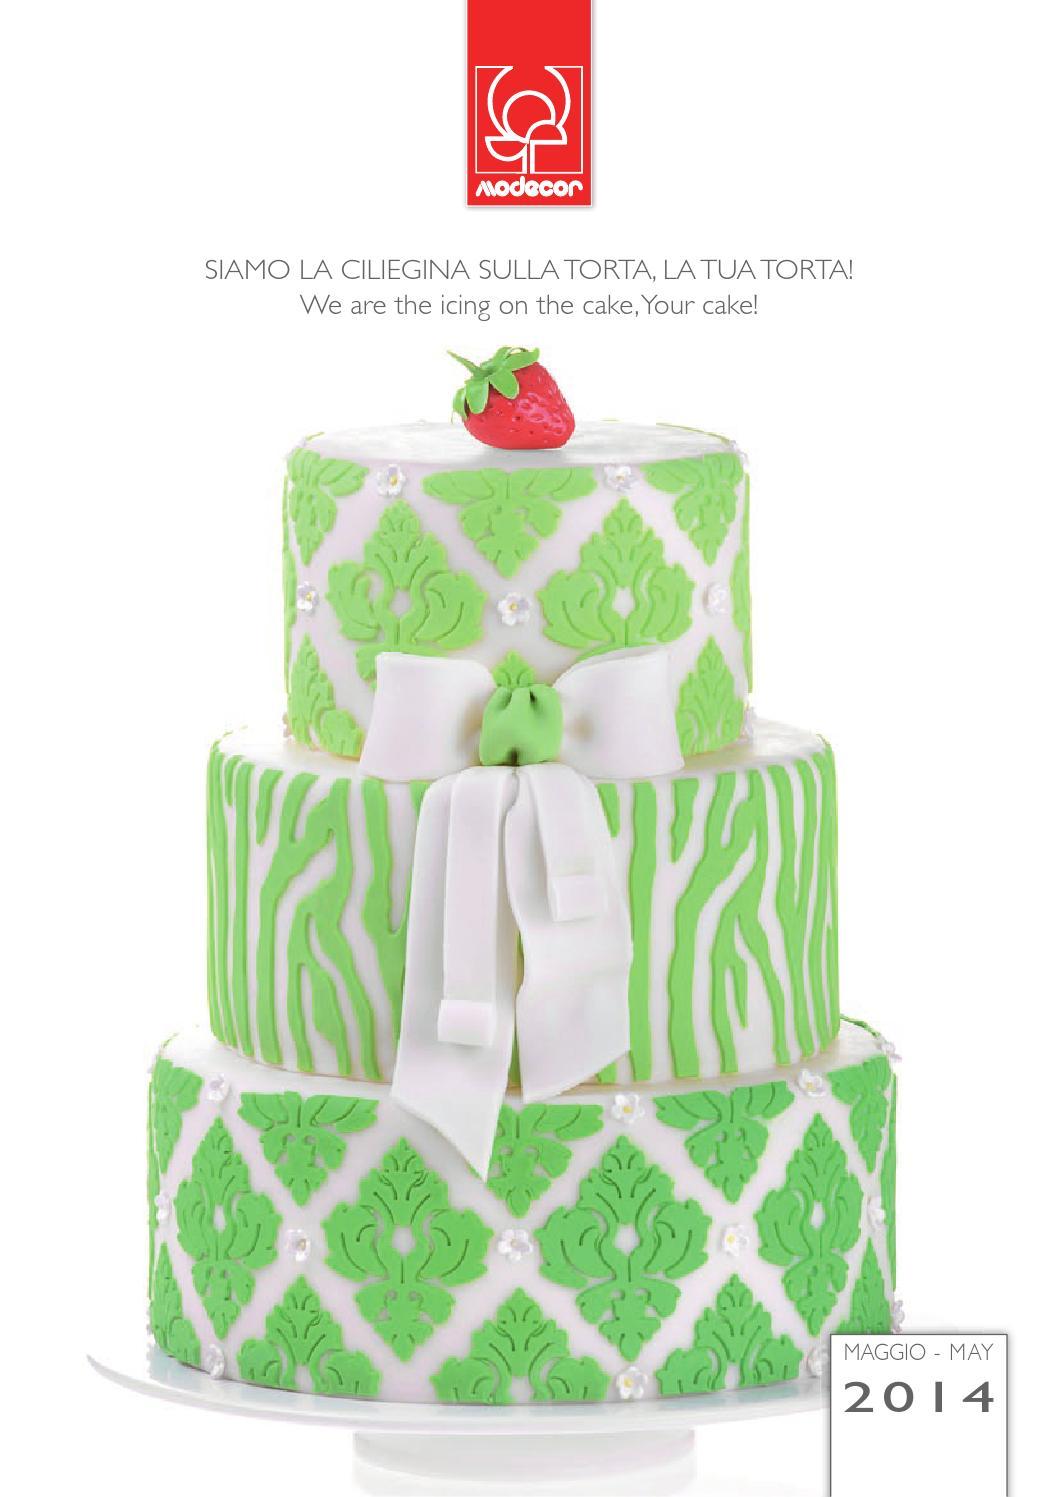 DECORGEL MAT BIANCO Cake Design Pasticceria Dolci Torte Zucchero 23204G